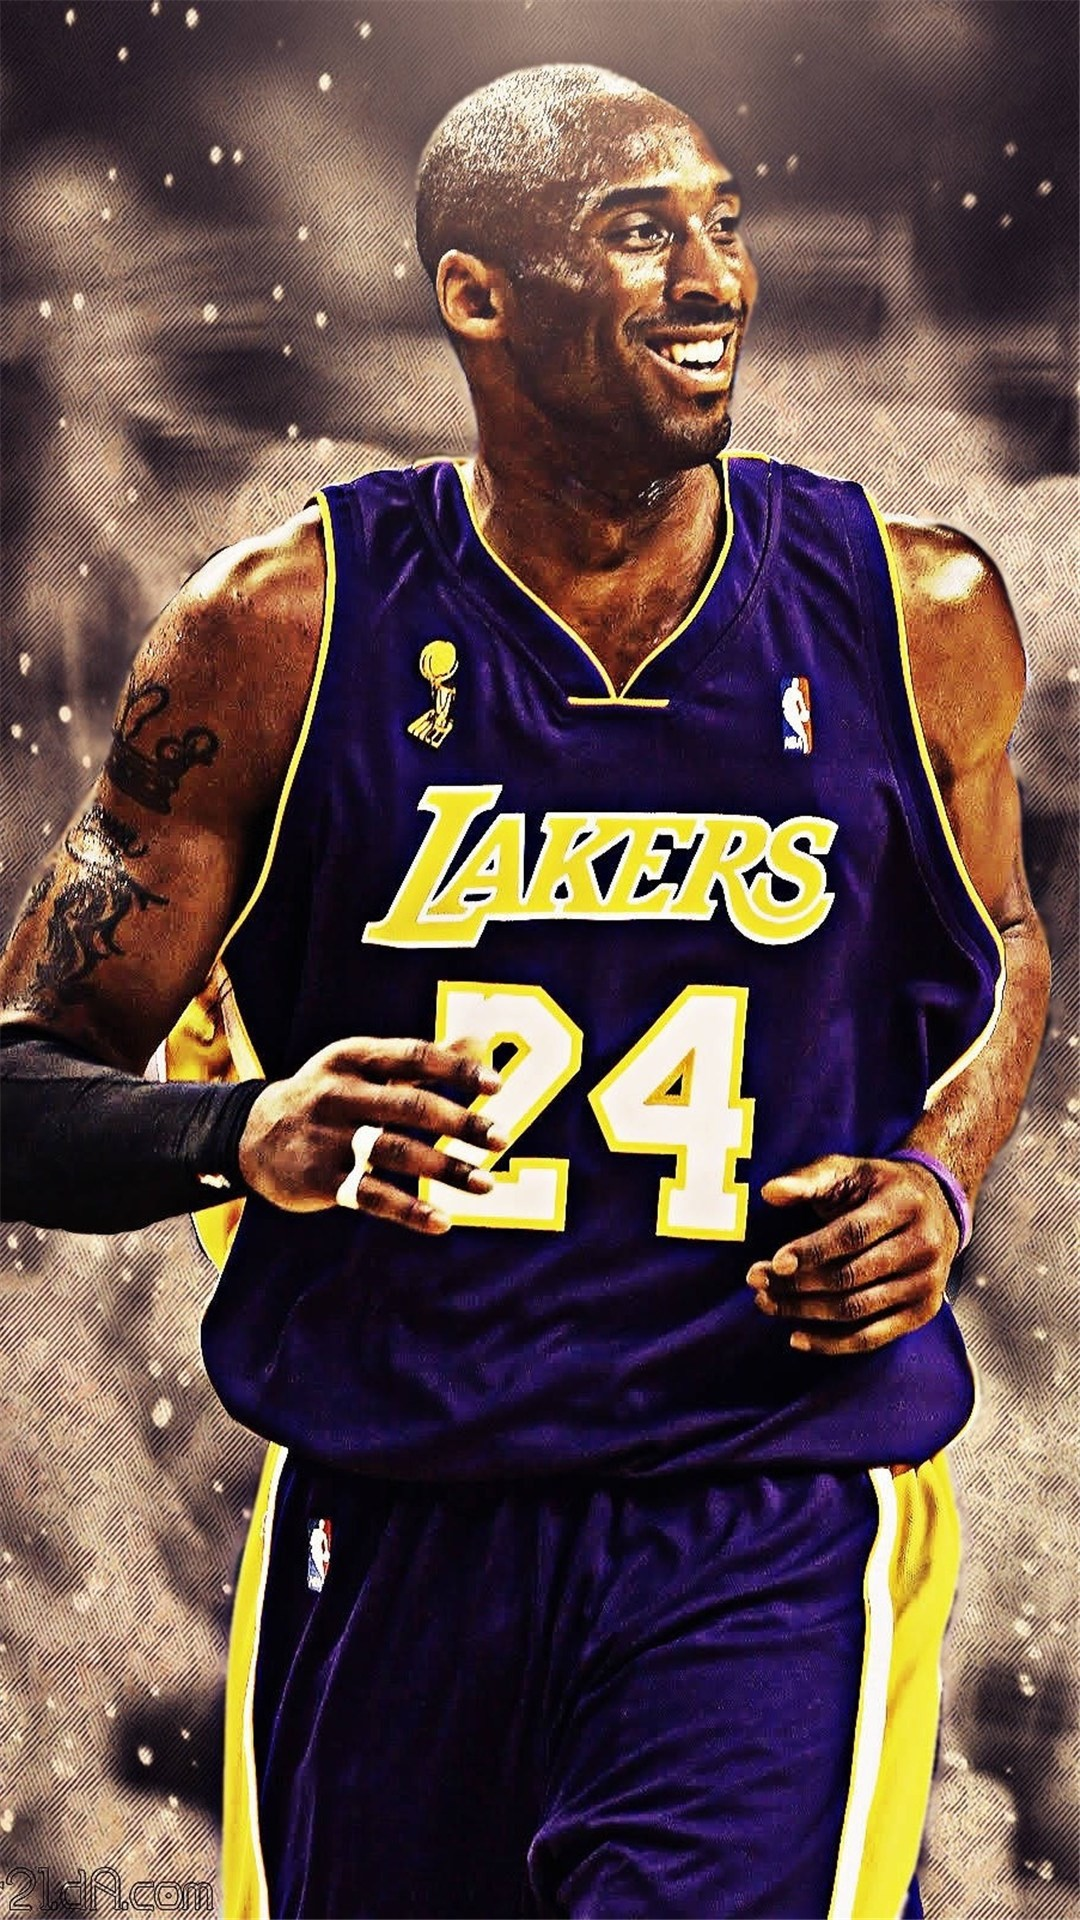 Kobe Bryant Dunk Wallpaper (70+ images)